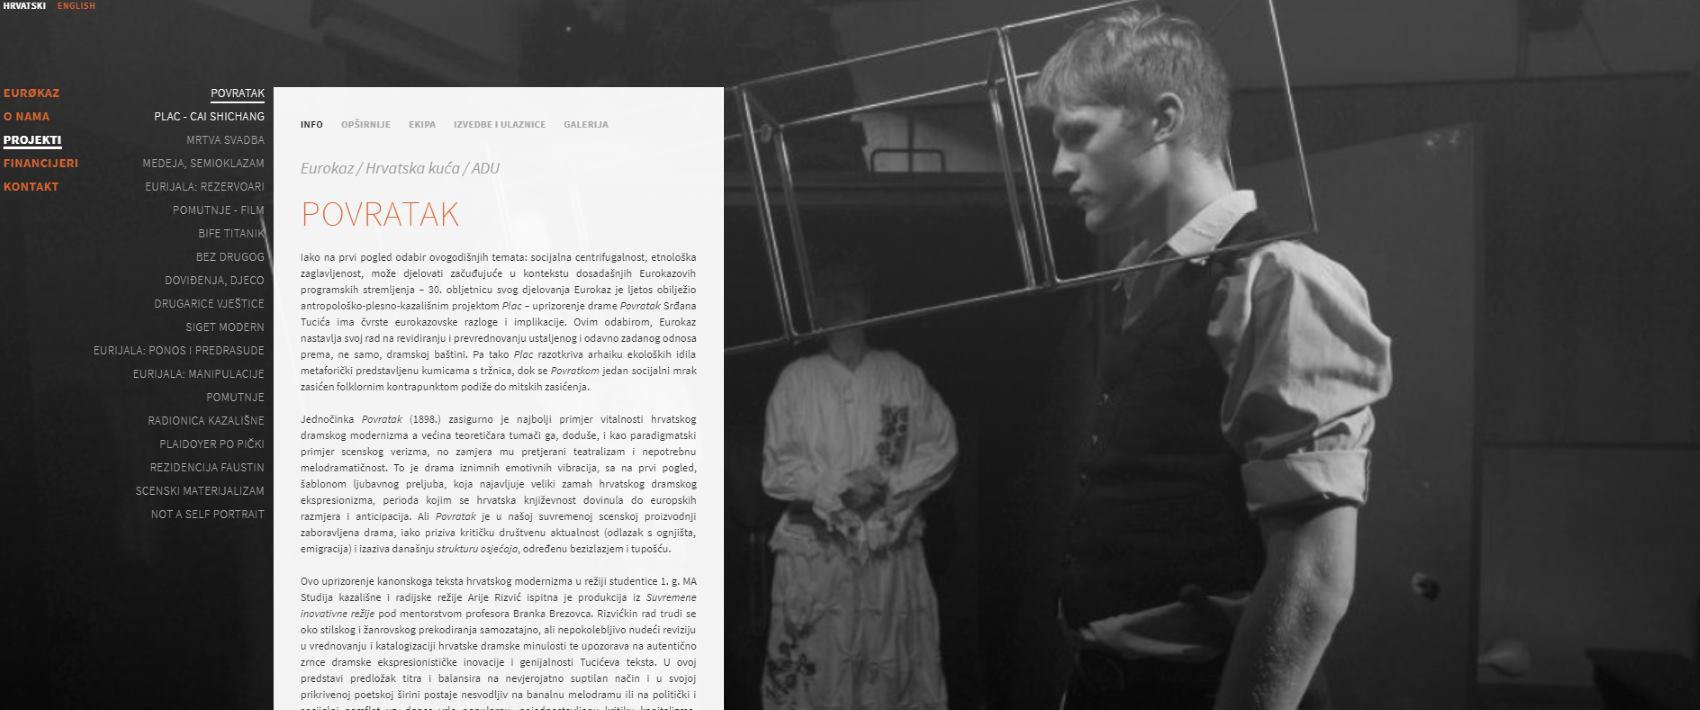 EUROKAZ Predstava 'Povratak' je primjer vitalnosti hrvatskog dramskog modernizma